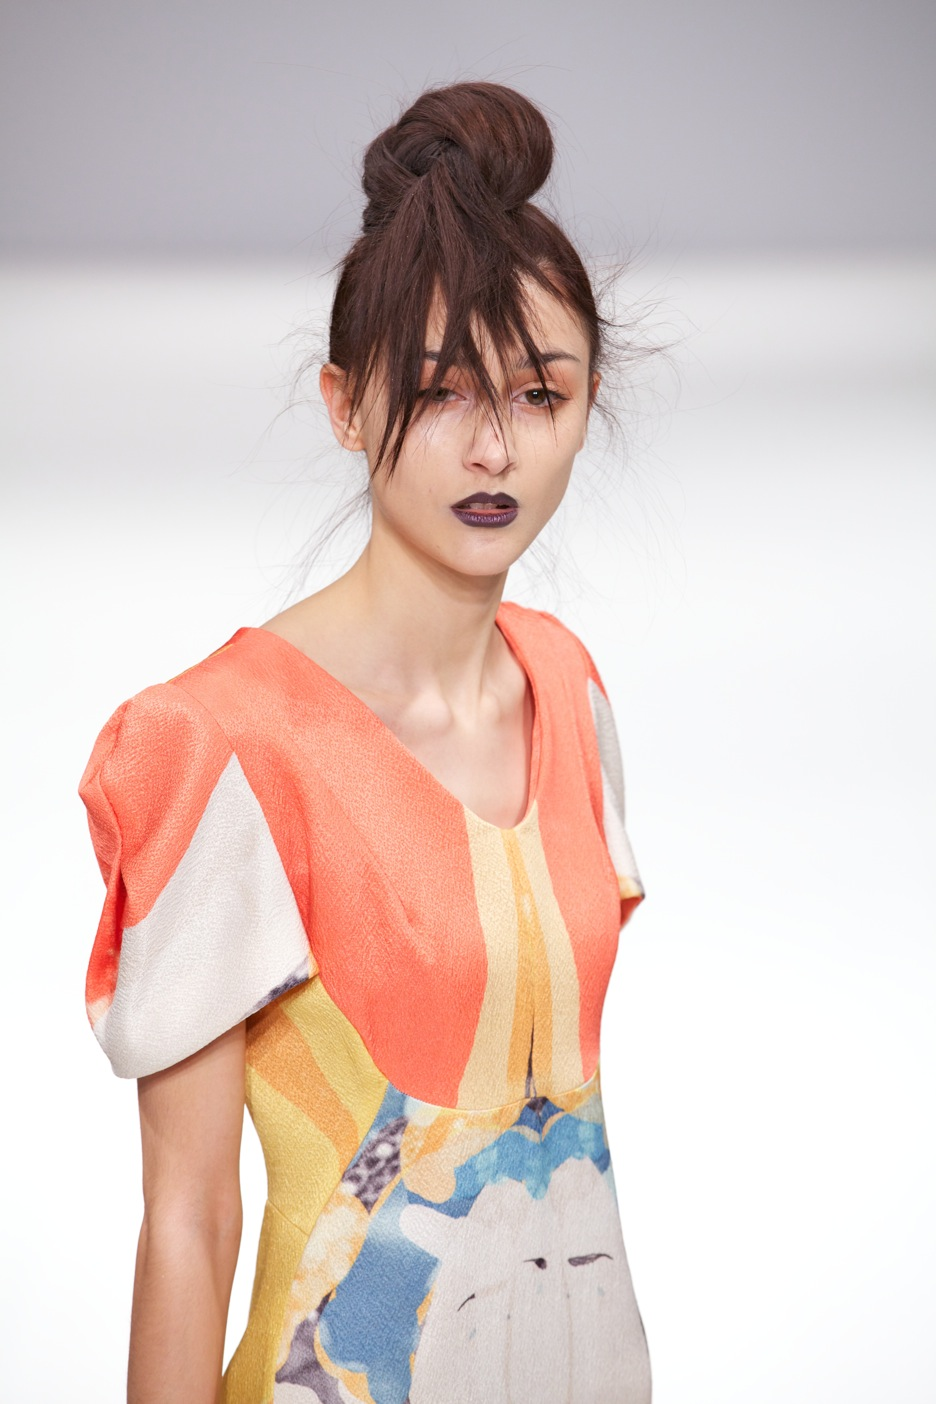 Lulu Liu A-W 2014 (c) Marcaitken 2014  31.jpg